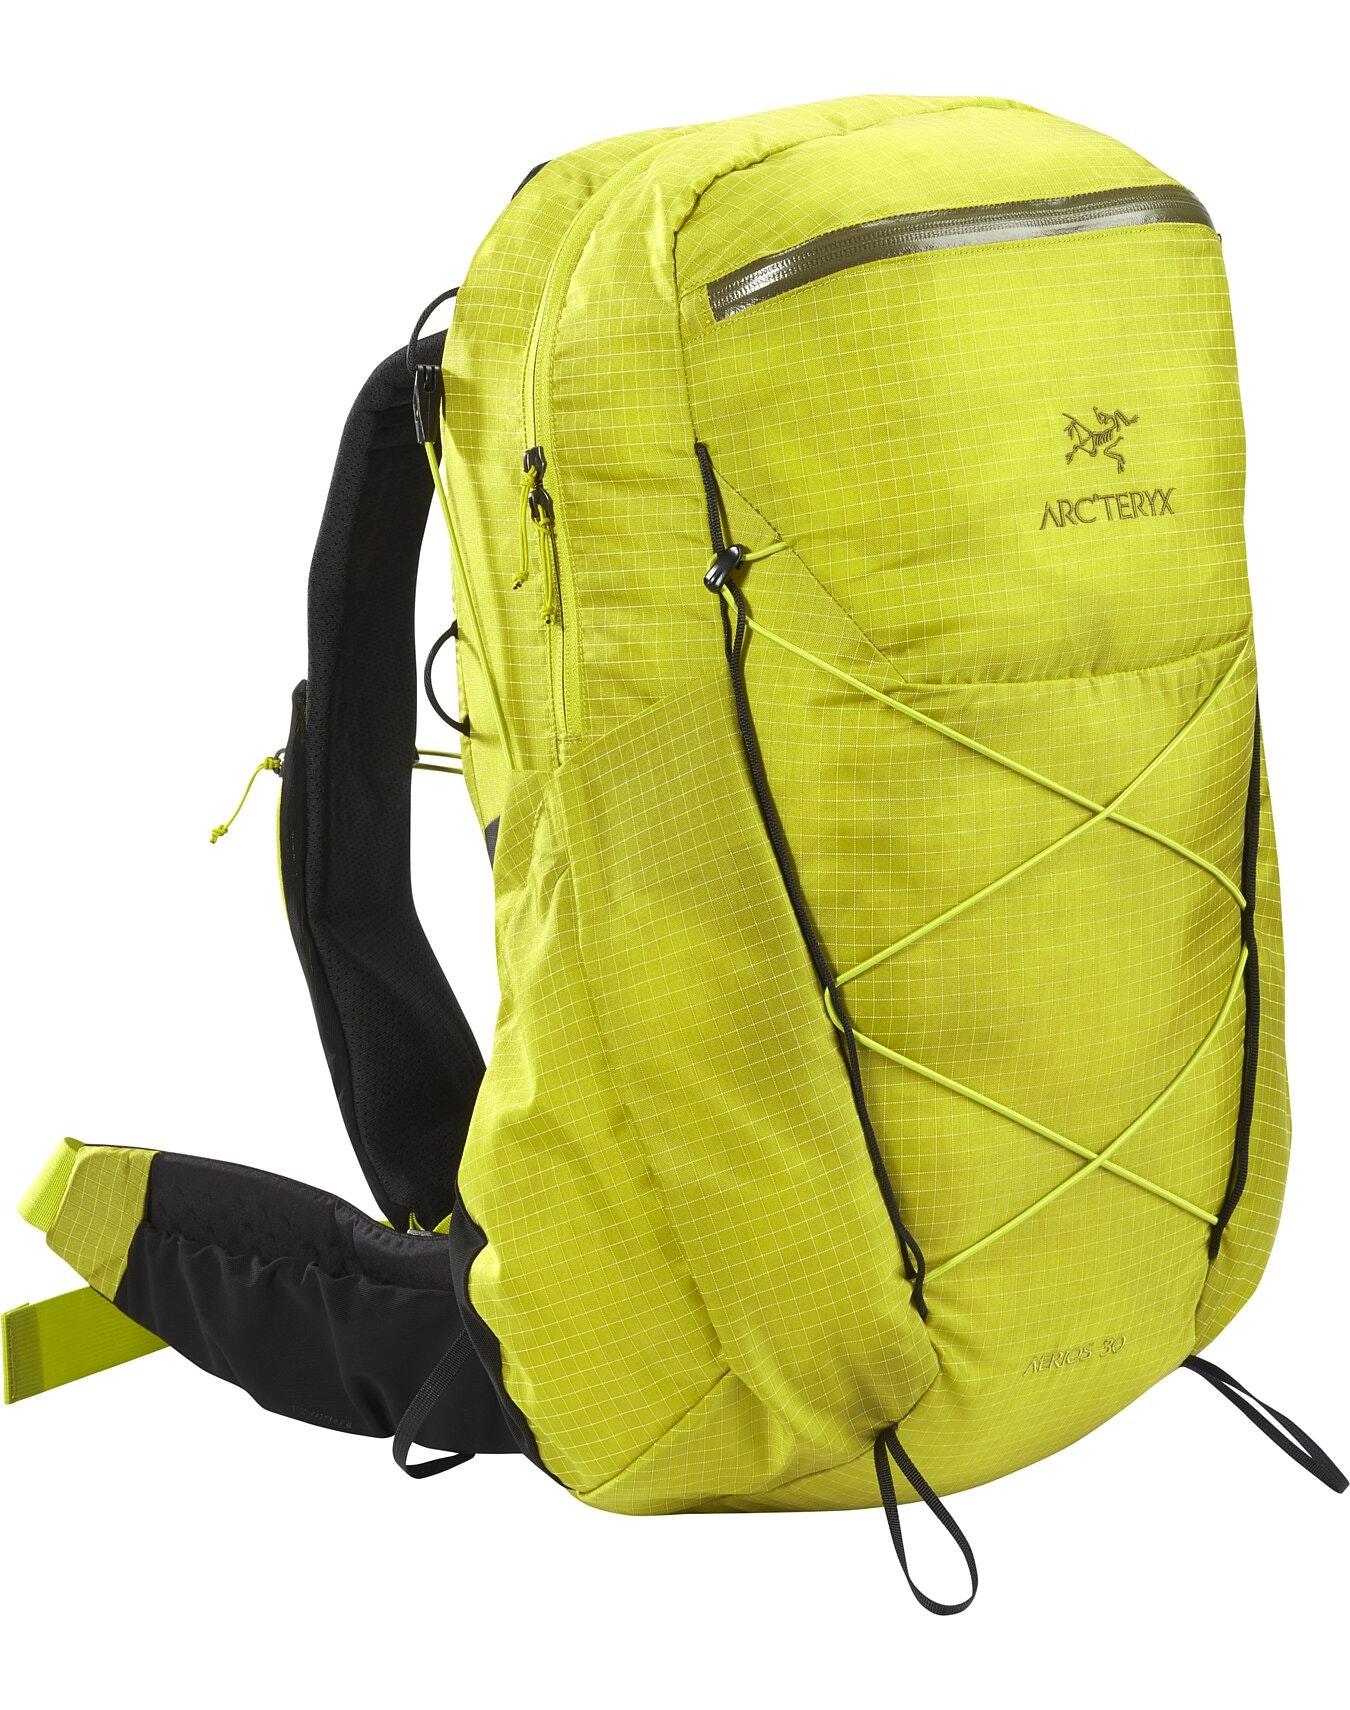 Aerios 30 Backpack Glade